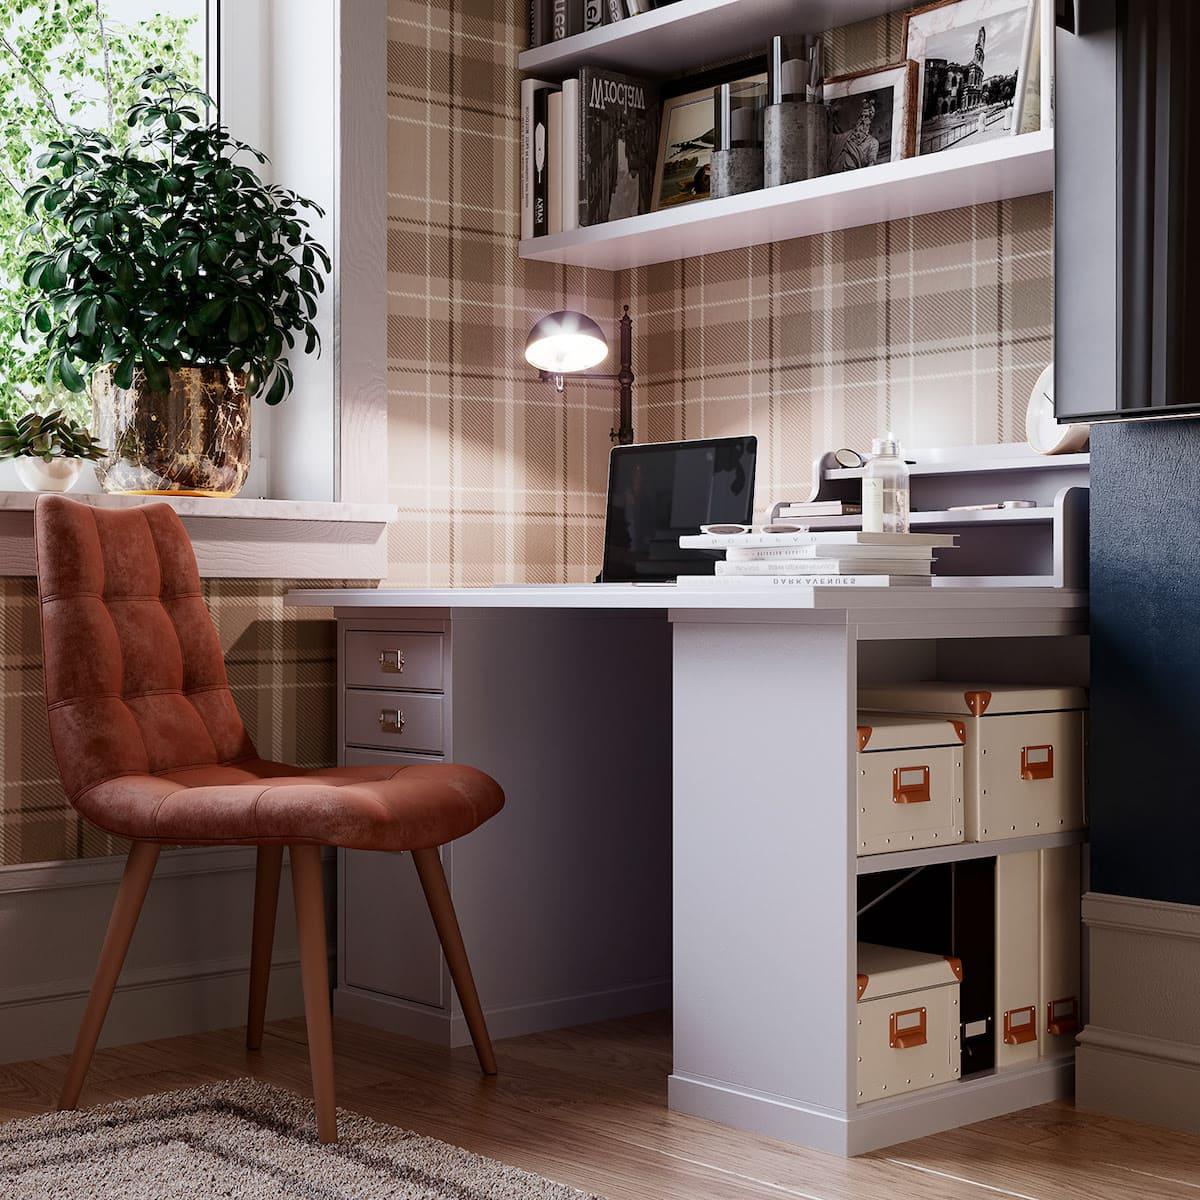 модный дизайн интерьера квартиры фото 70